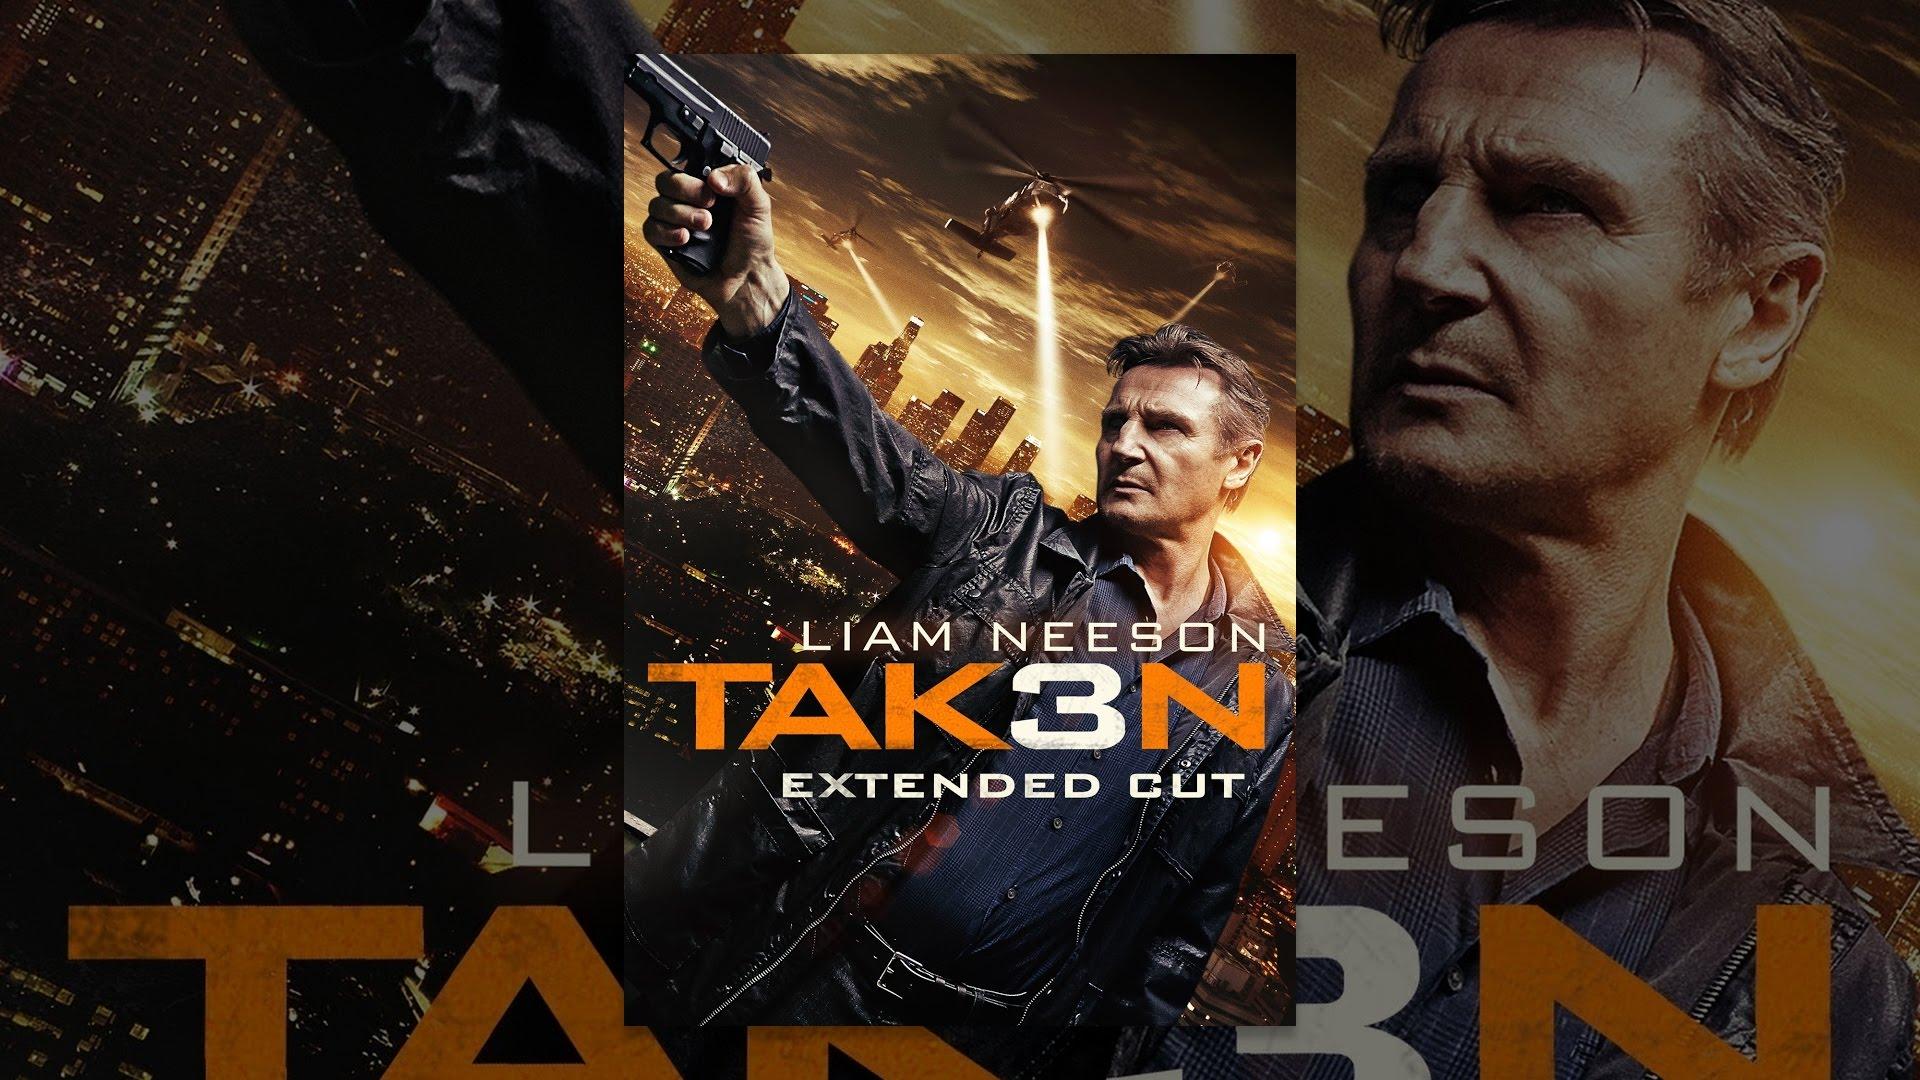 Download Taken 3 Extended